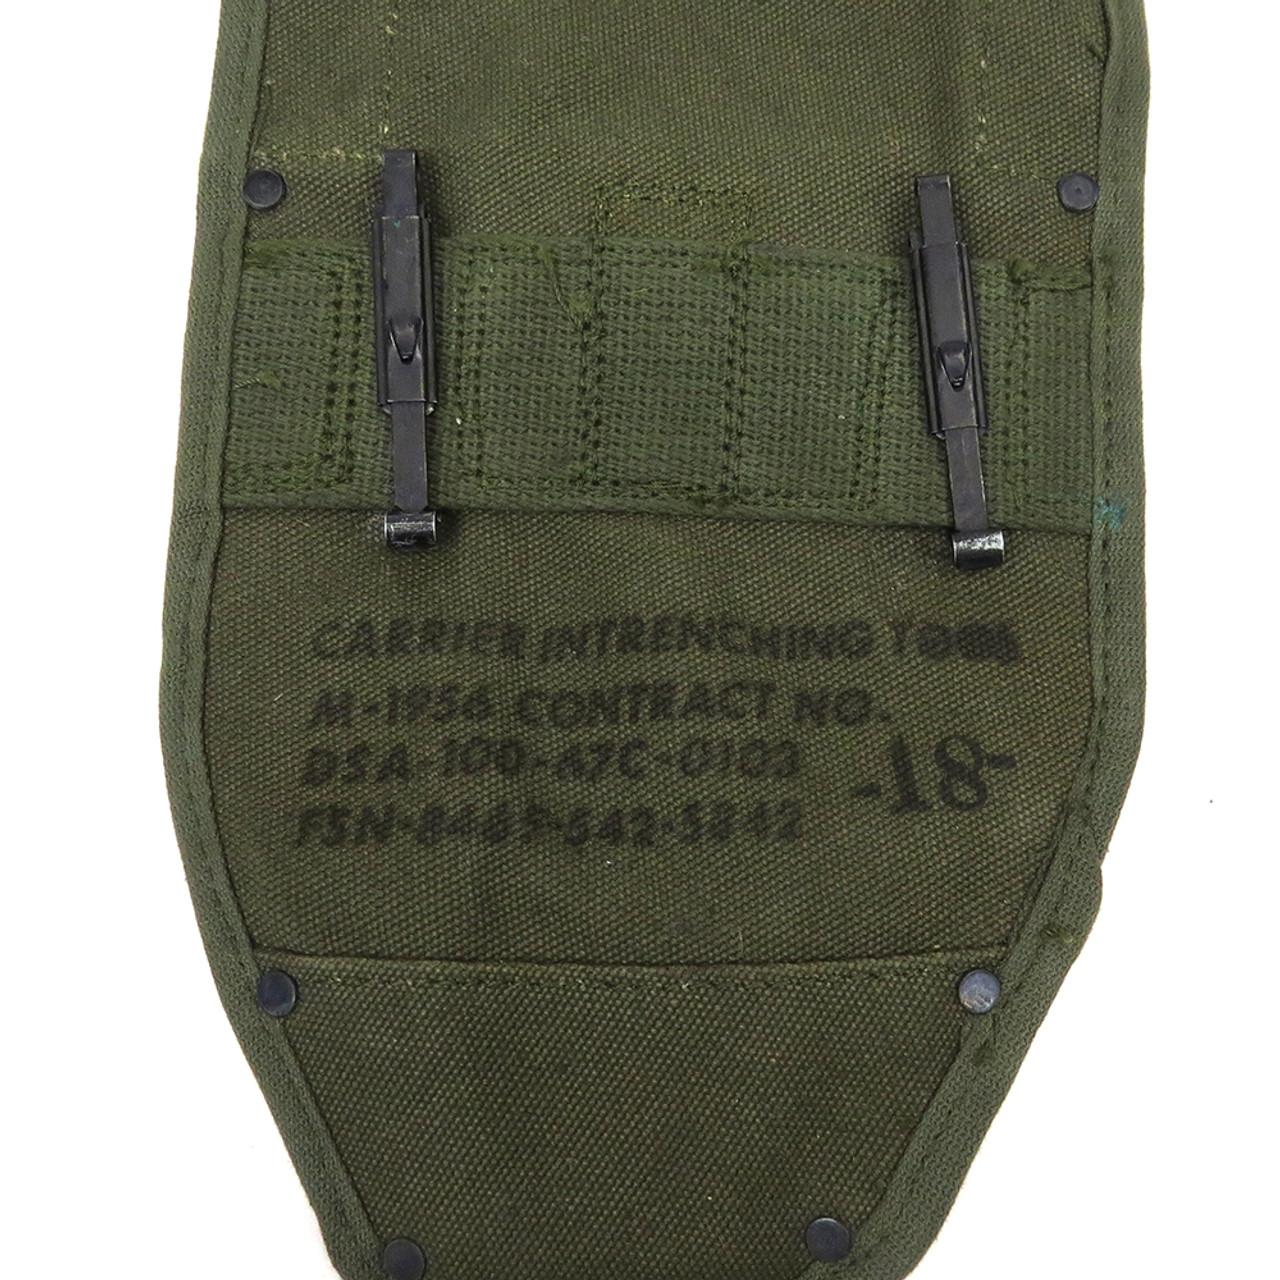 M56 E-Tool Carrier